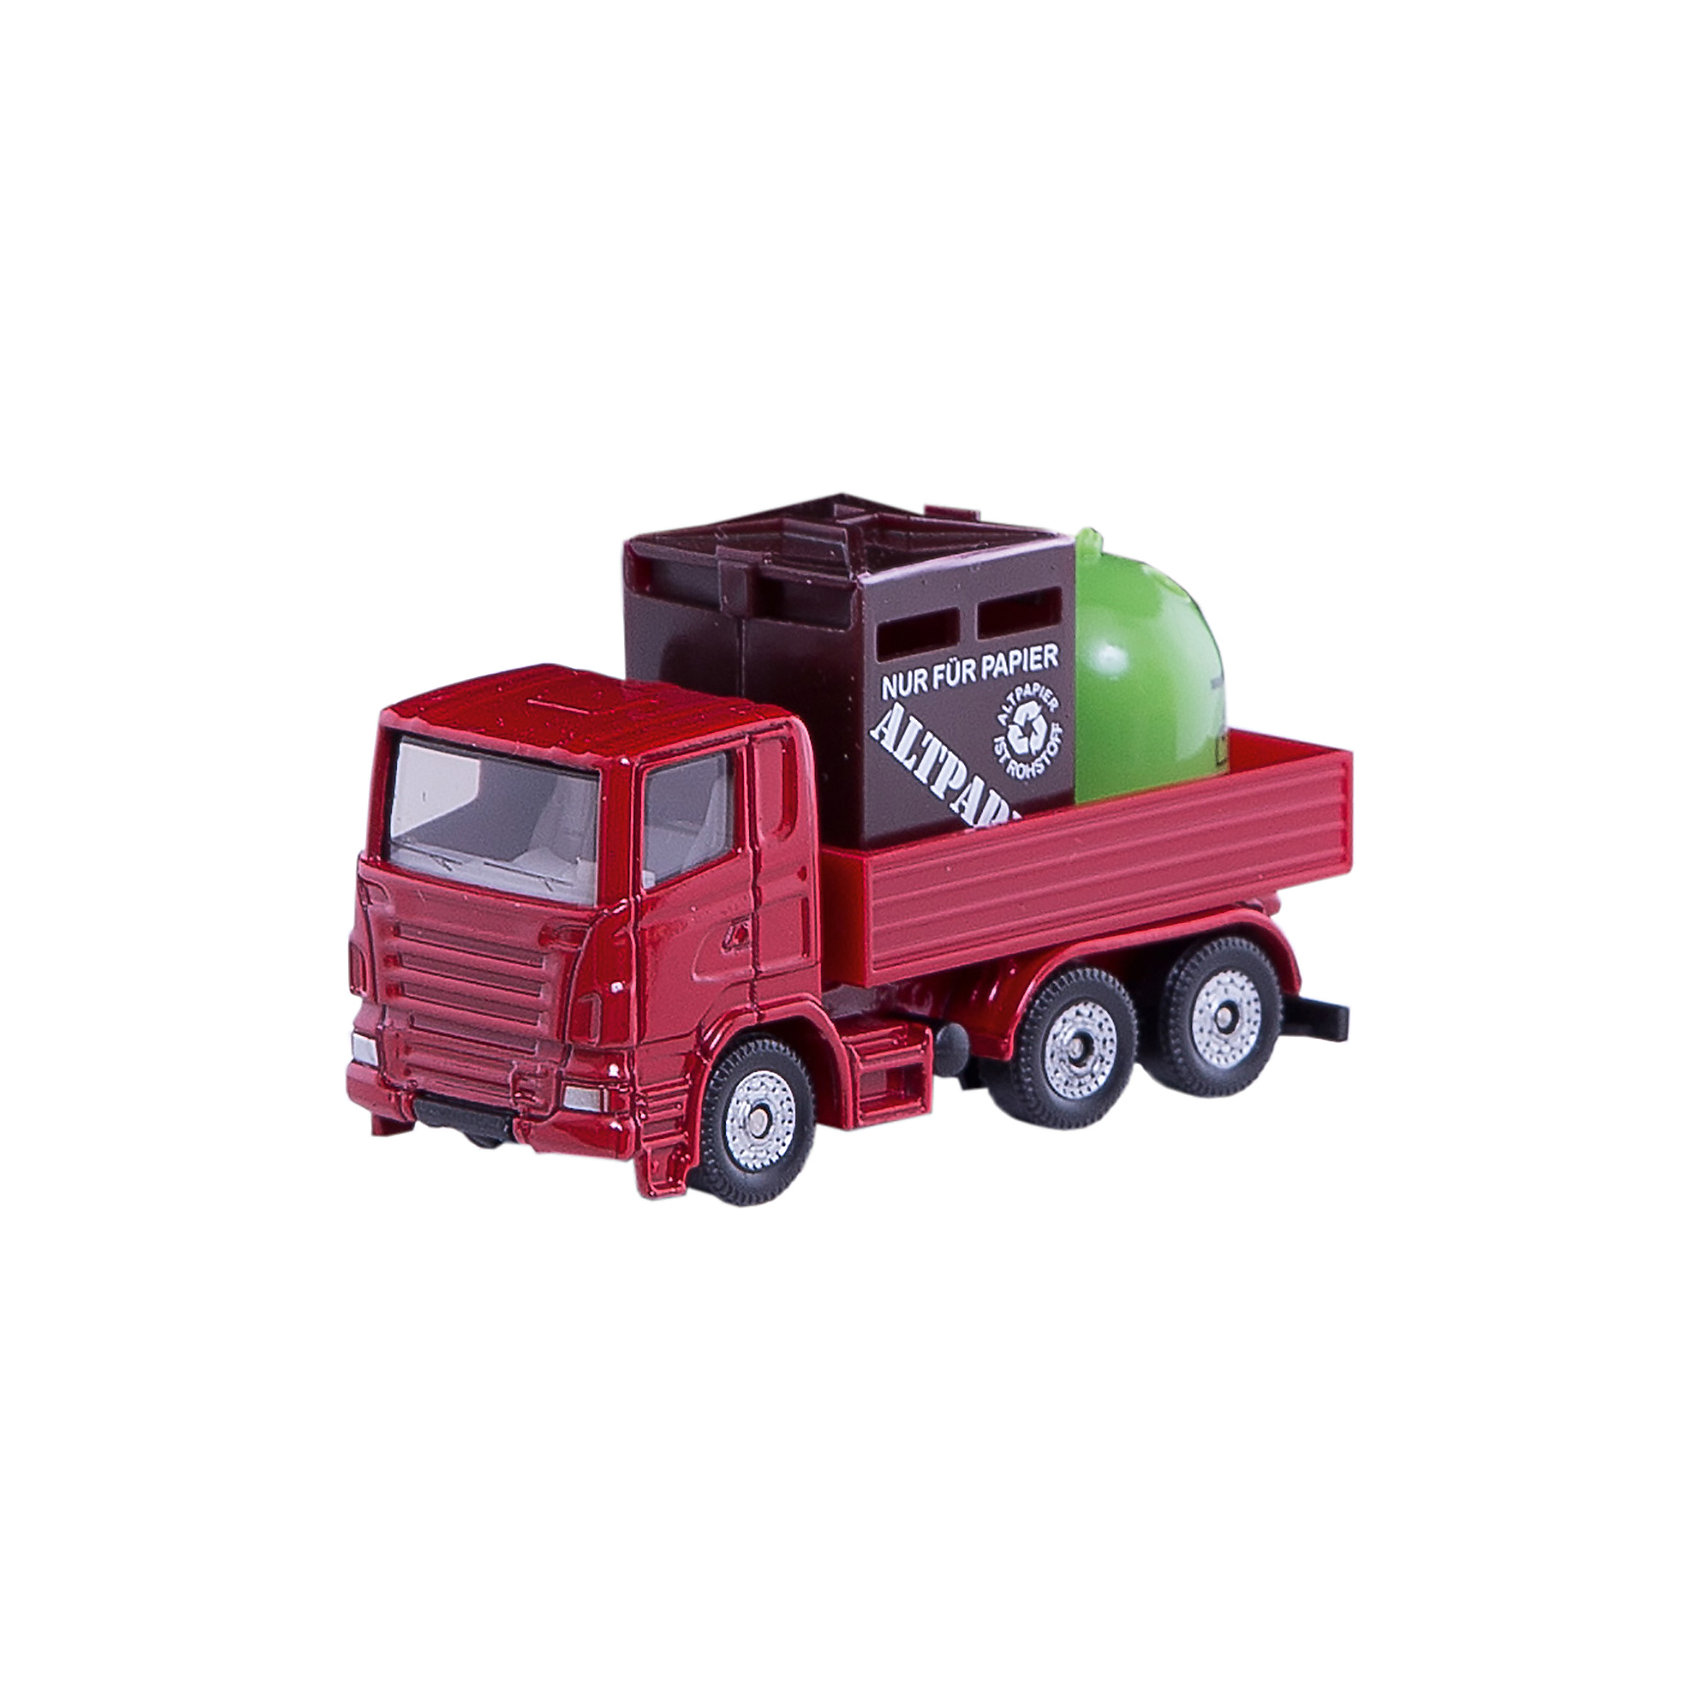 SIKU SIKU 0828 Грузовик с мусорными контейнерами siku siku 1610 низкорамный грузовик с вертолетом